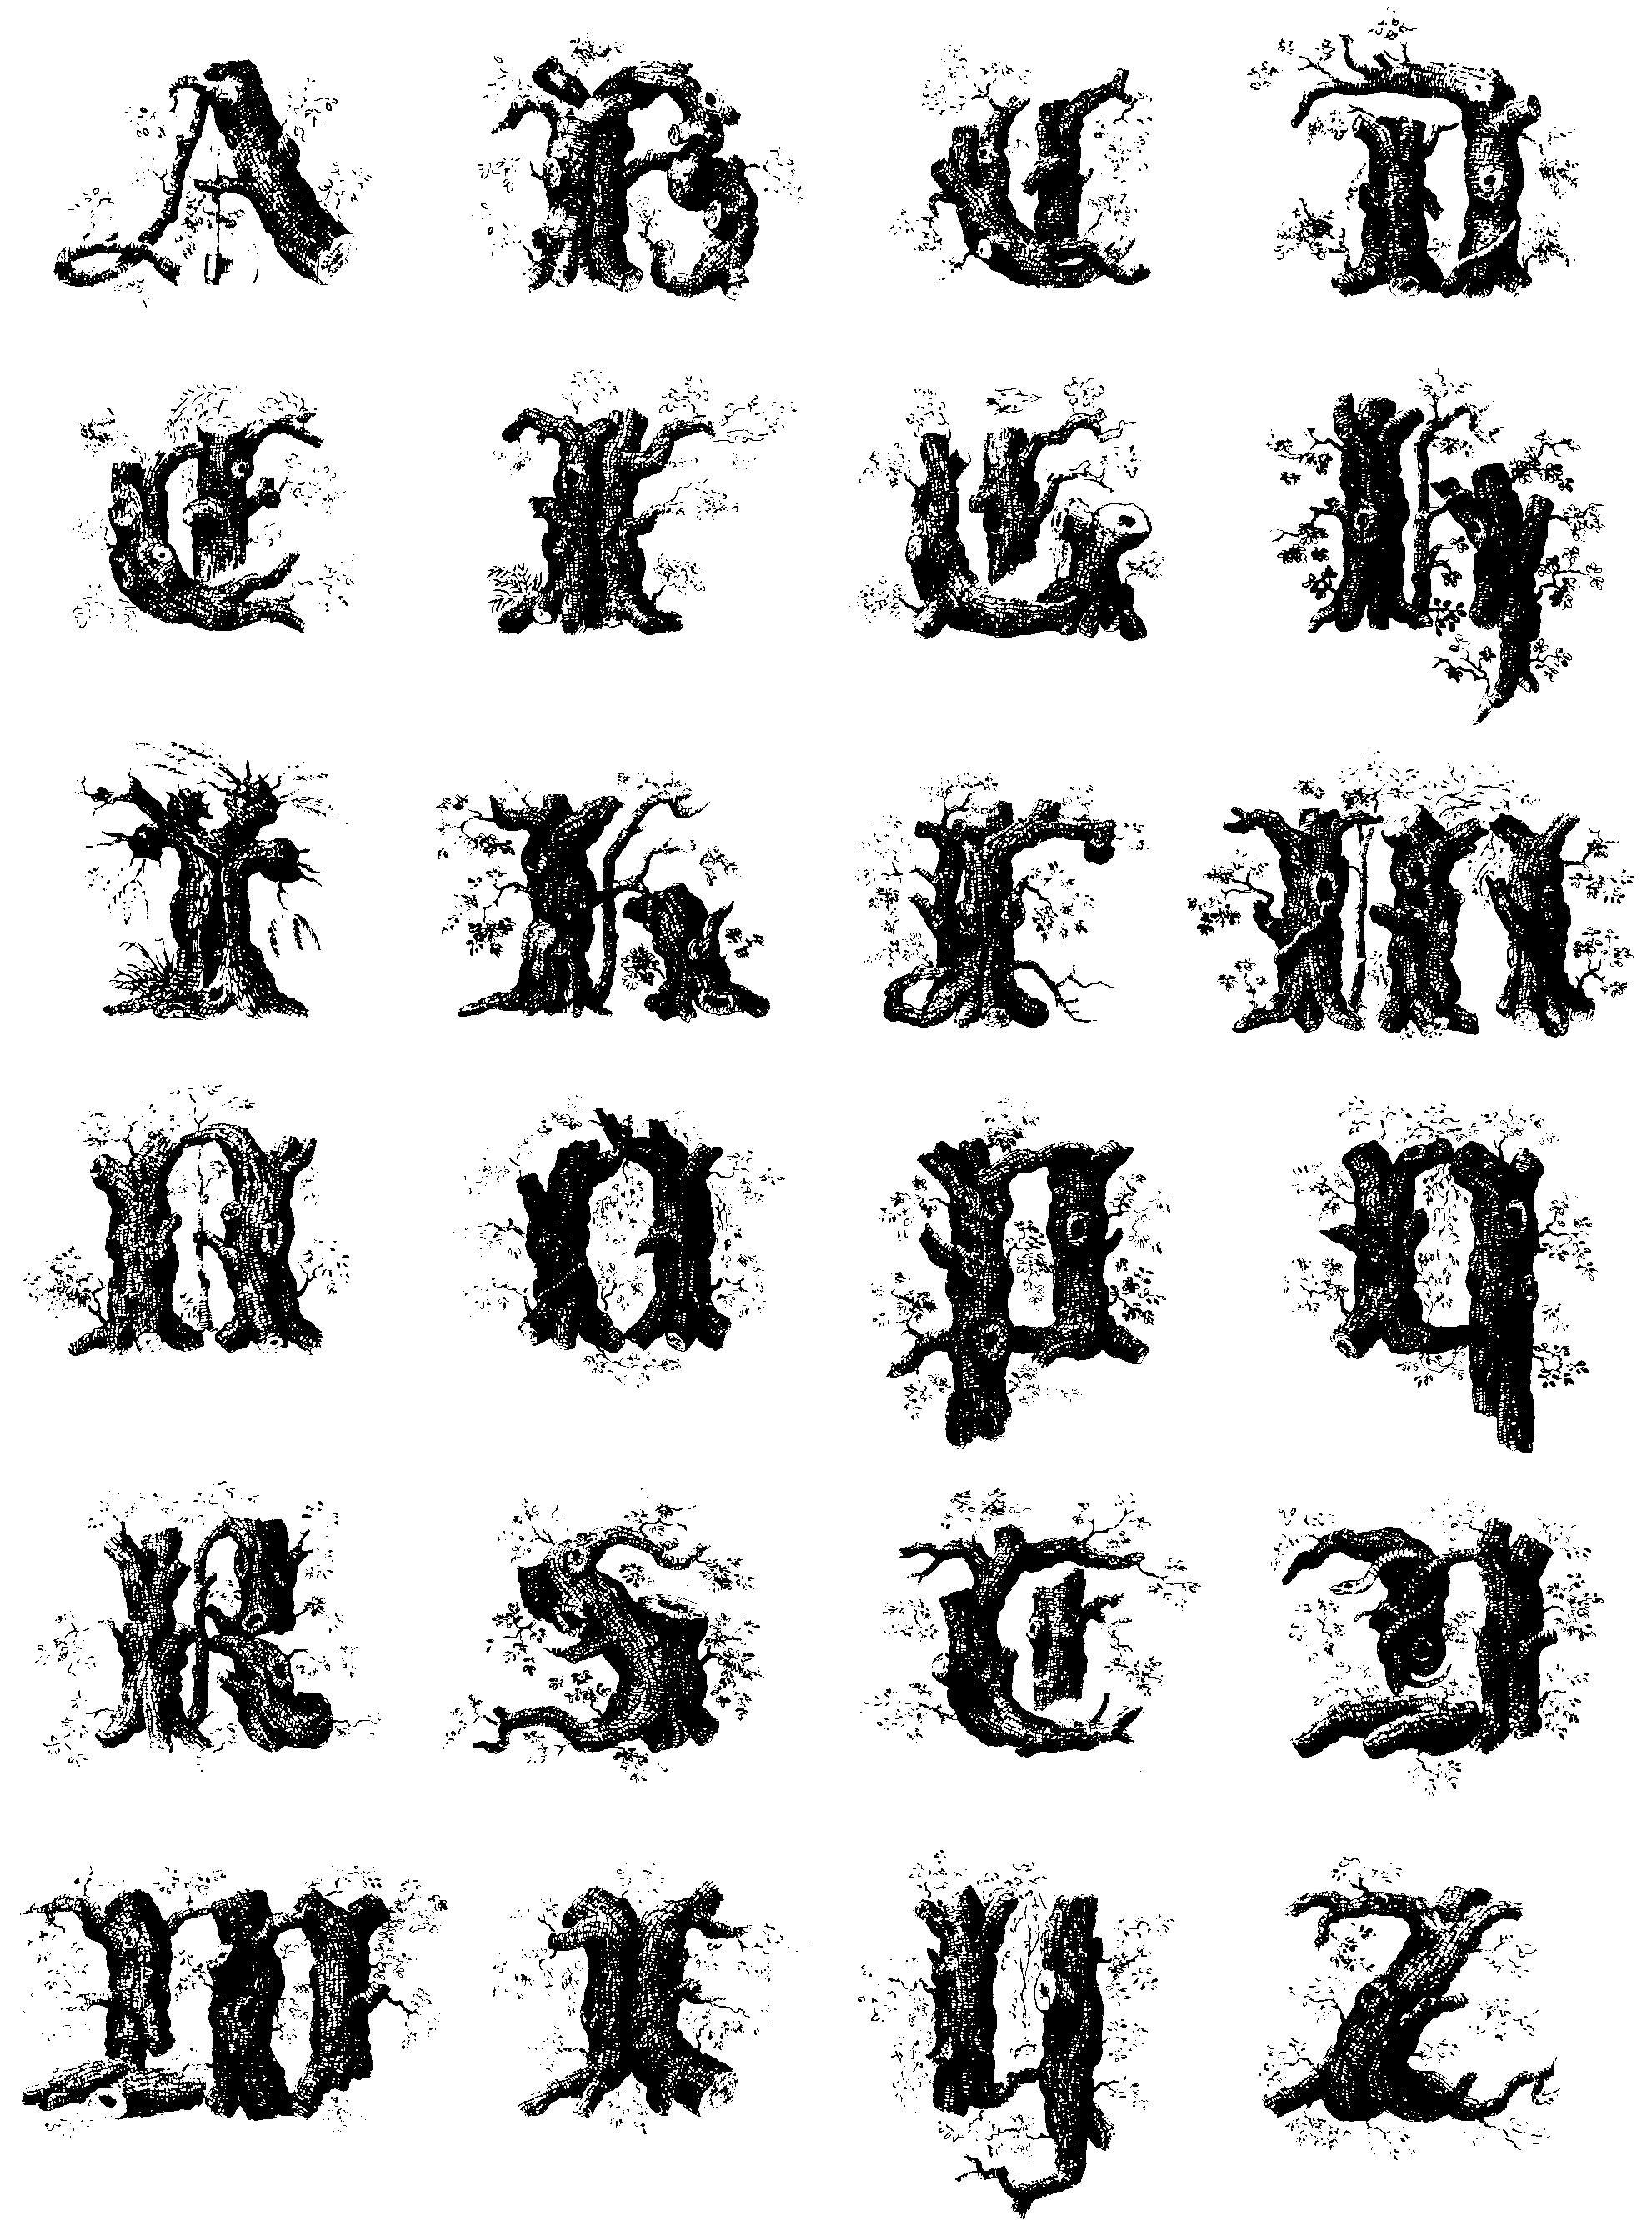 Stump or tree Alphabet by Mindgazer